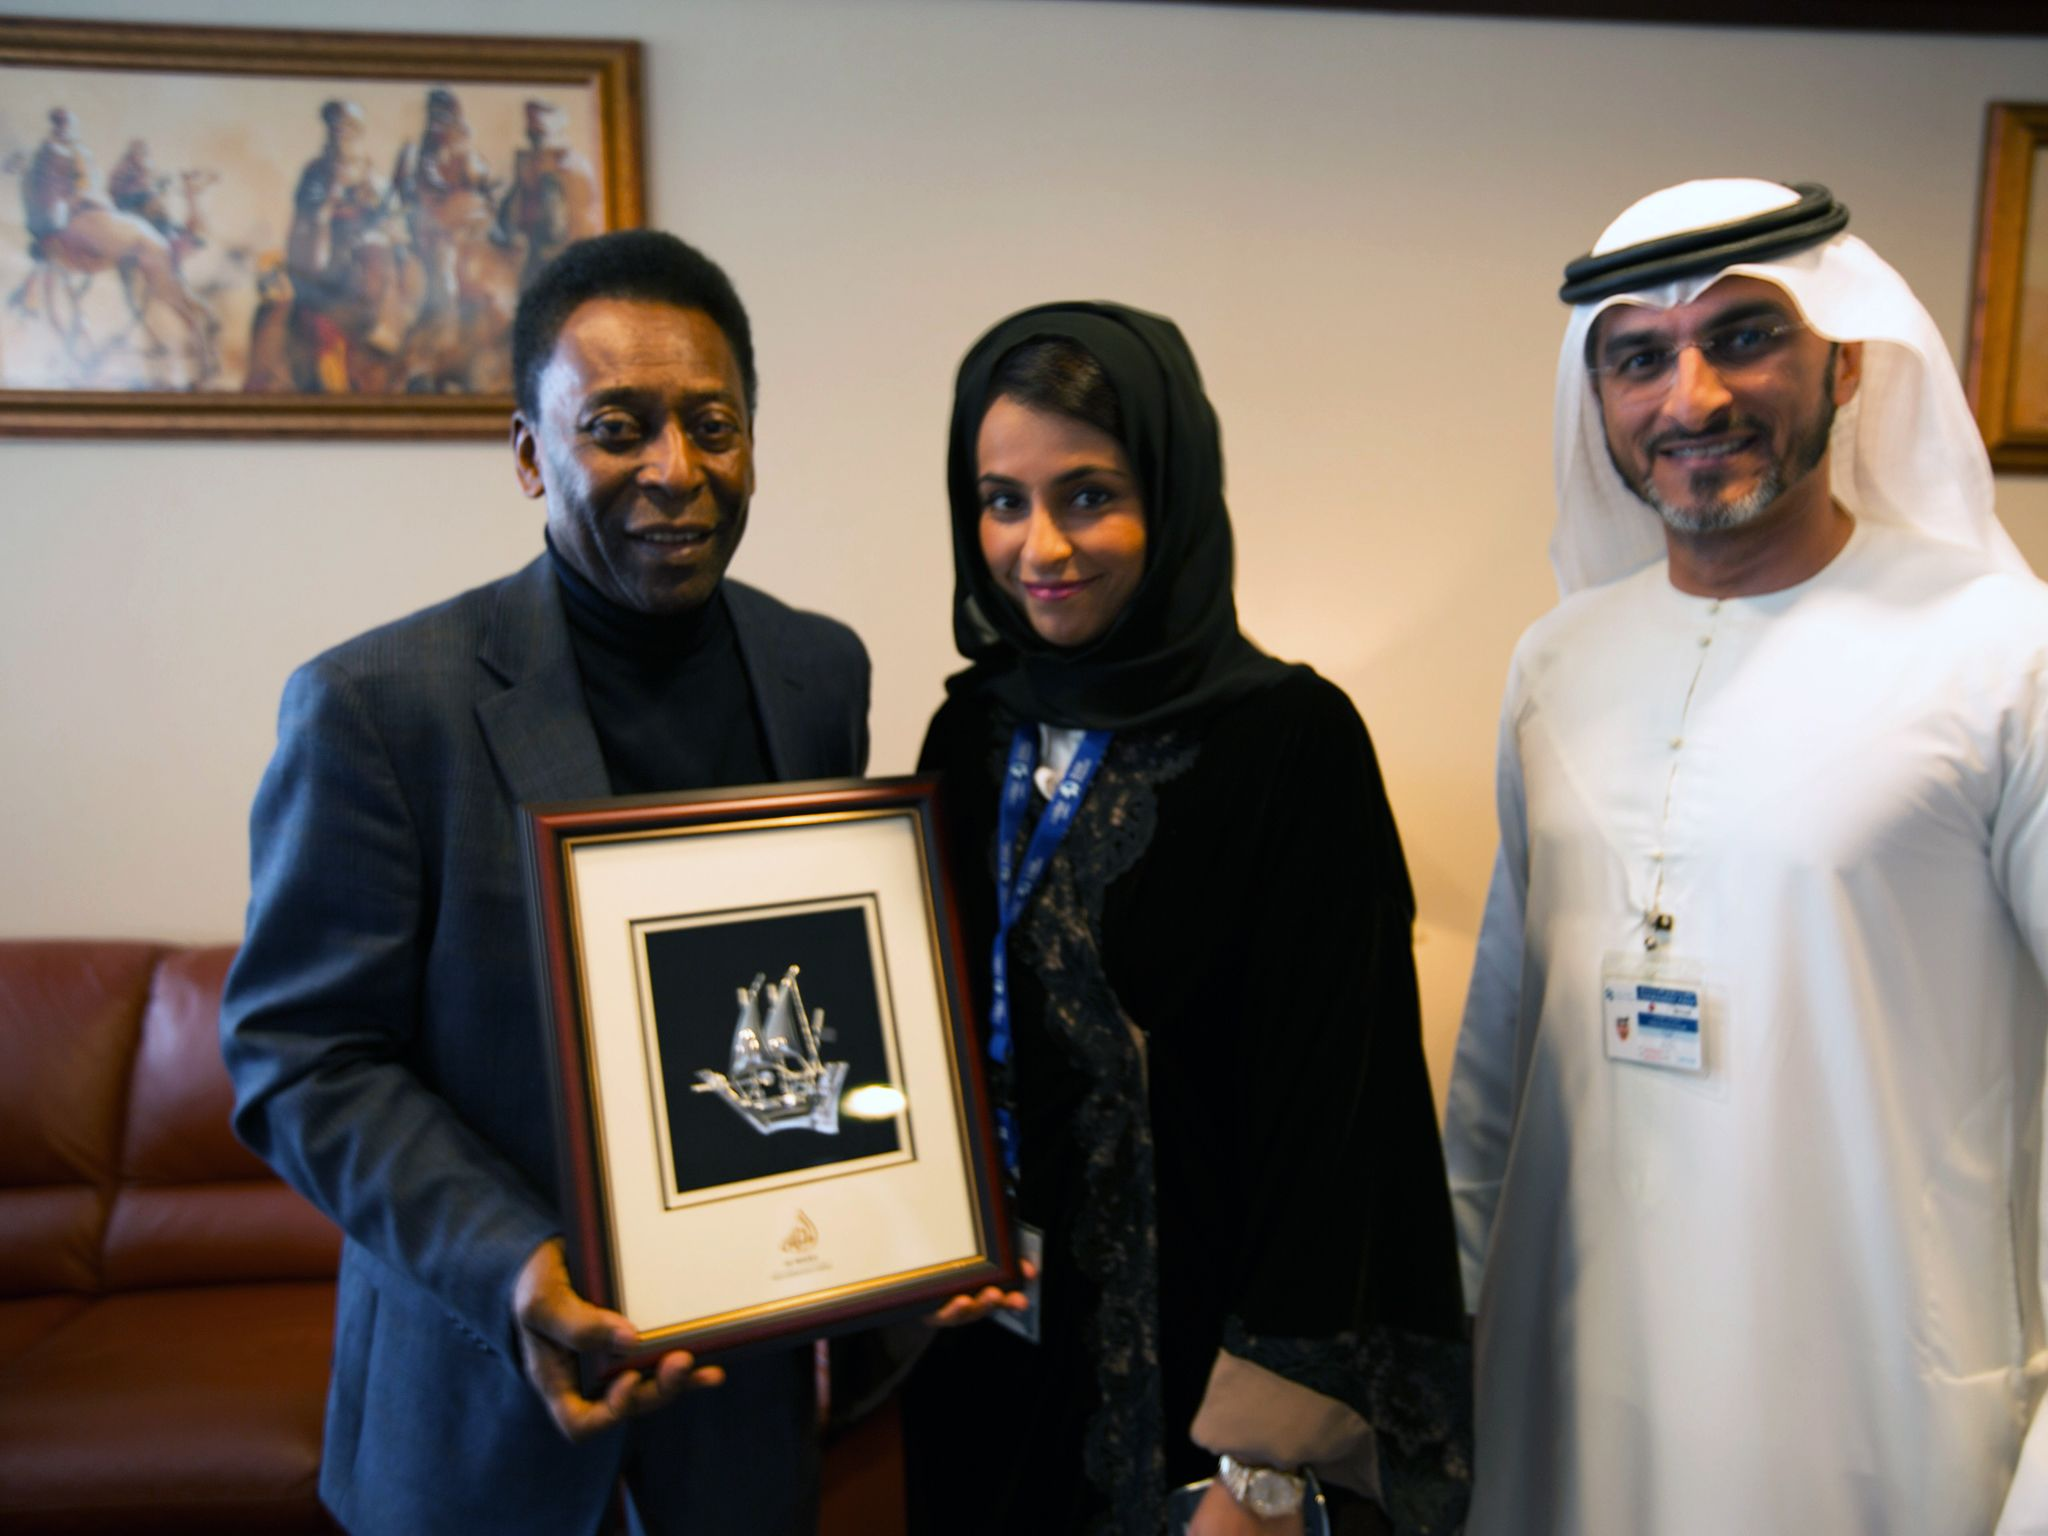 Dubai Airport, UAE: Pele poses for photos with Najla Al Midfa and Rabee Al Awadi. This image is... [Photo of the day - December 2014]